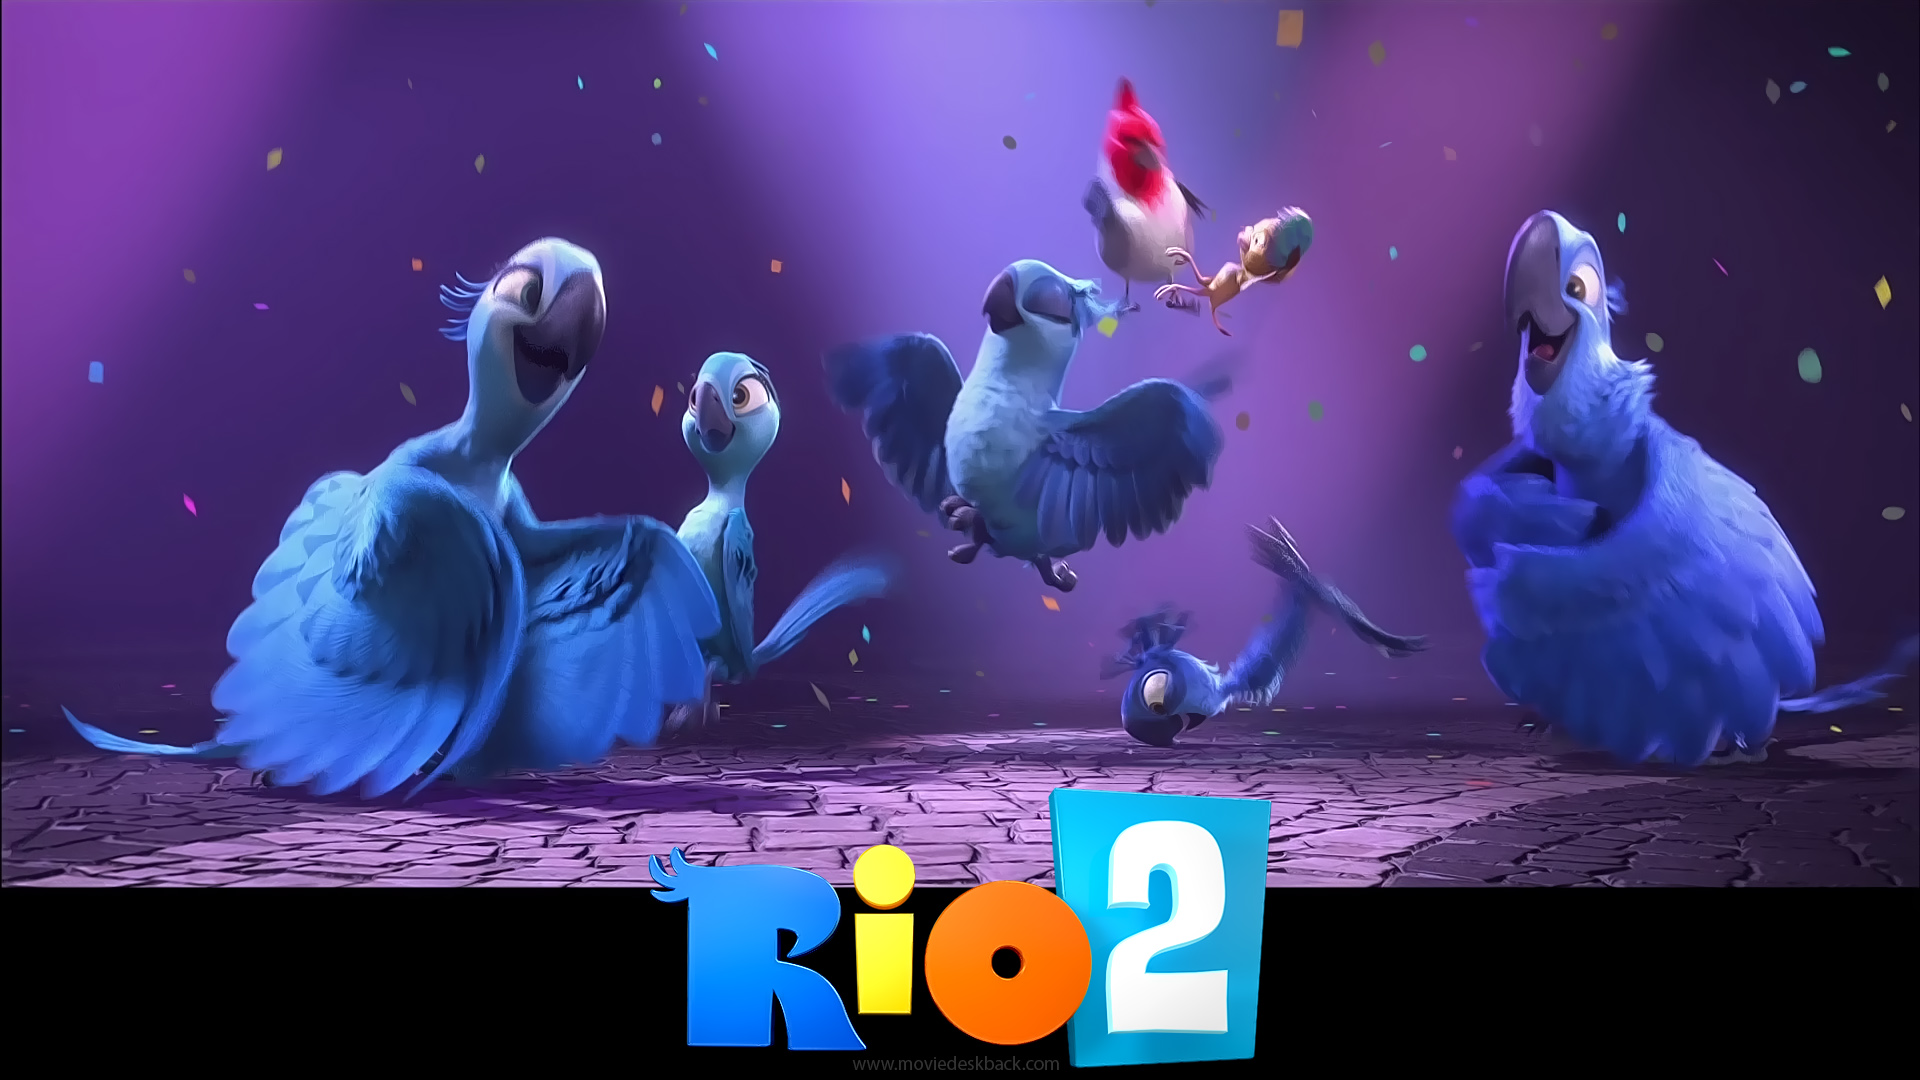 image - download-rio-2-wallpaper- | rio wiki | fandom powered